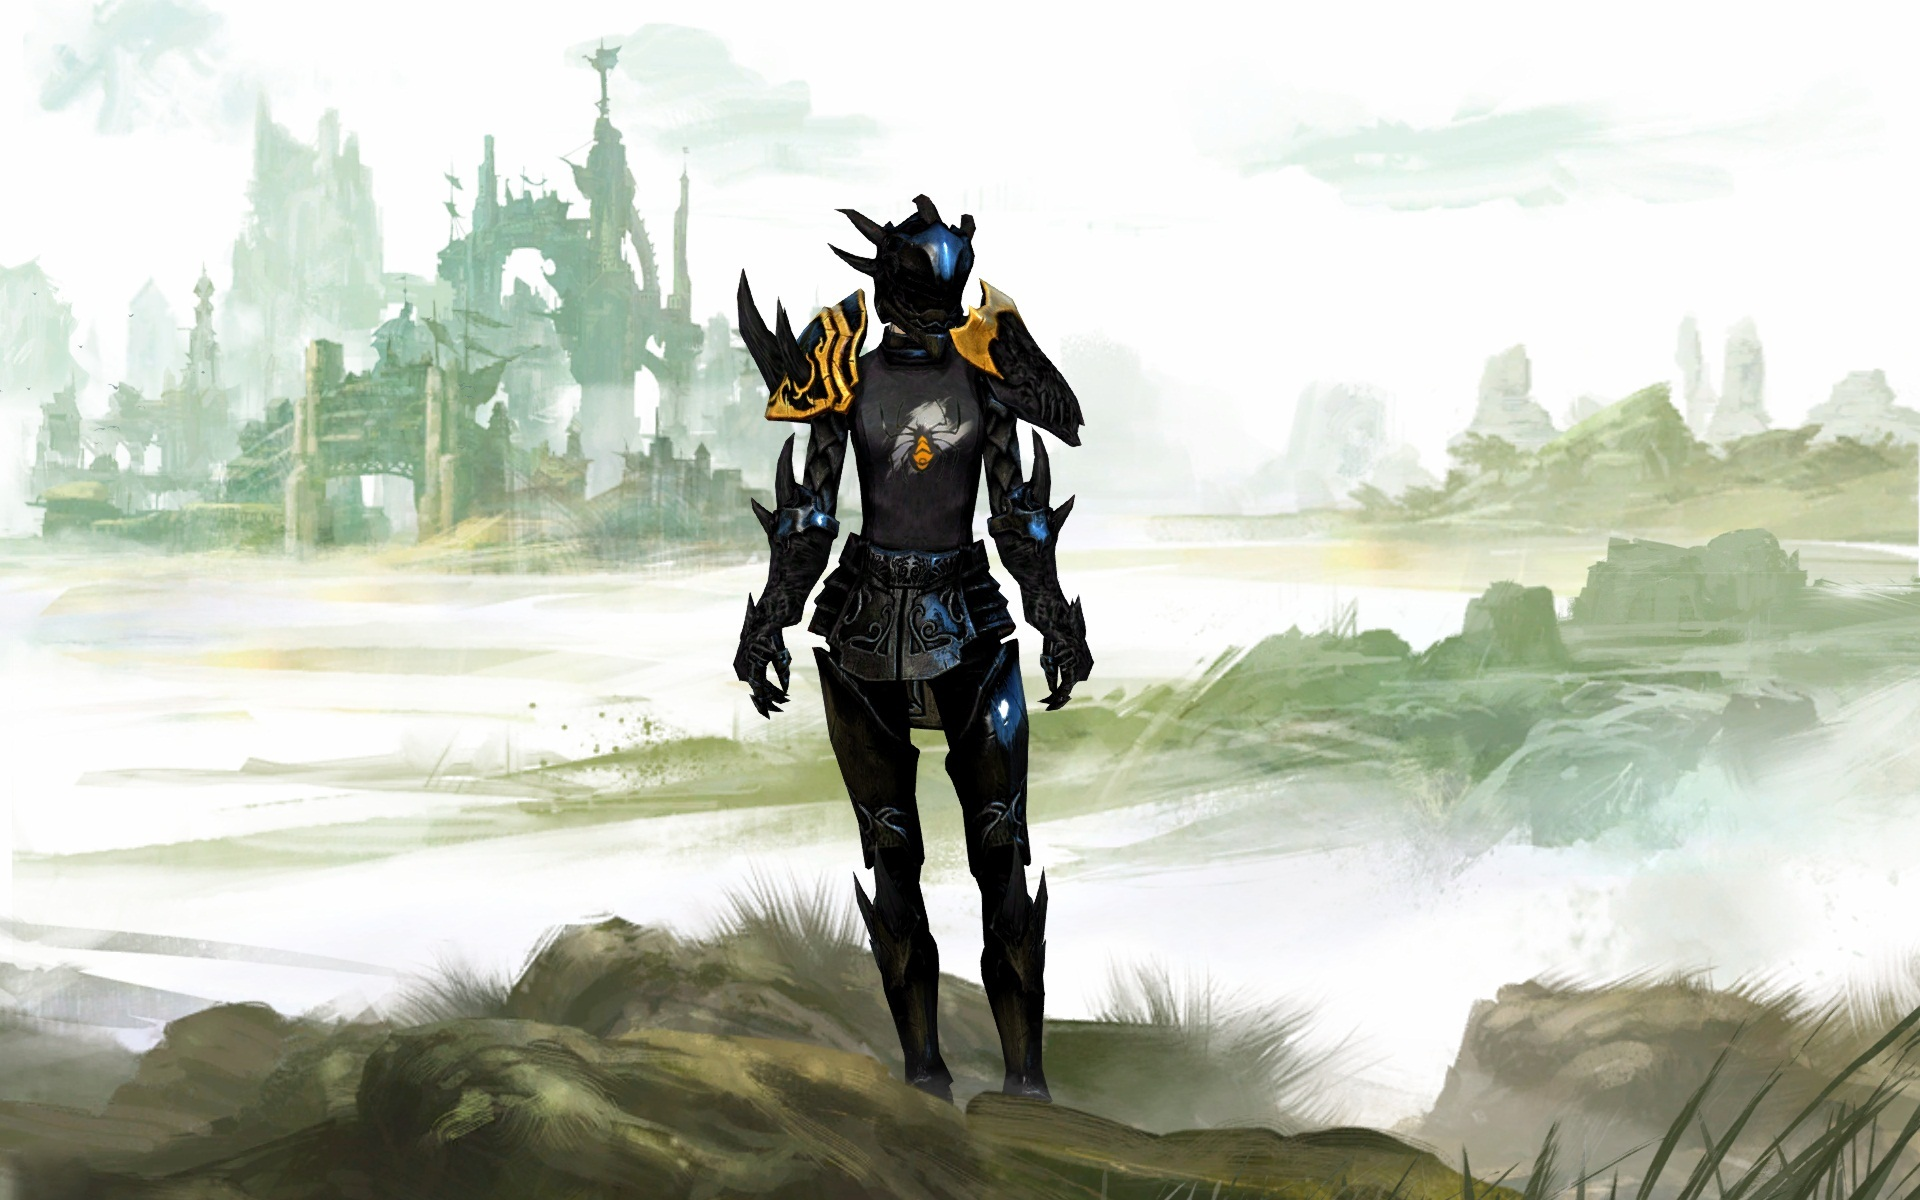 guild wars 2 armor - photo #24